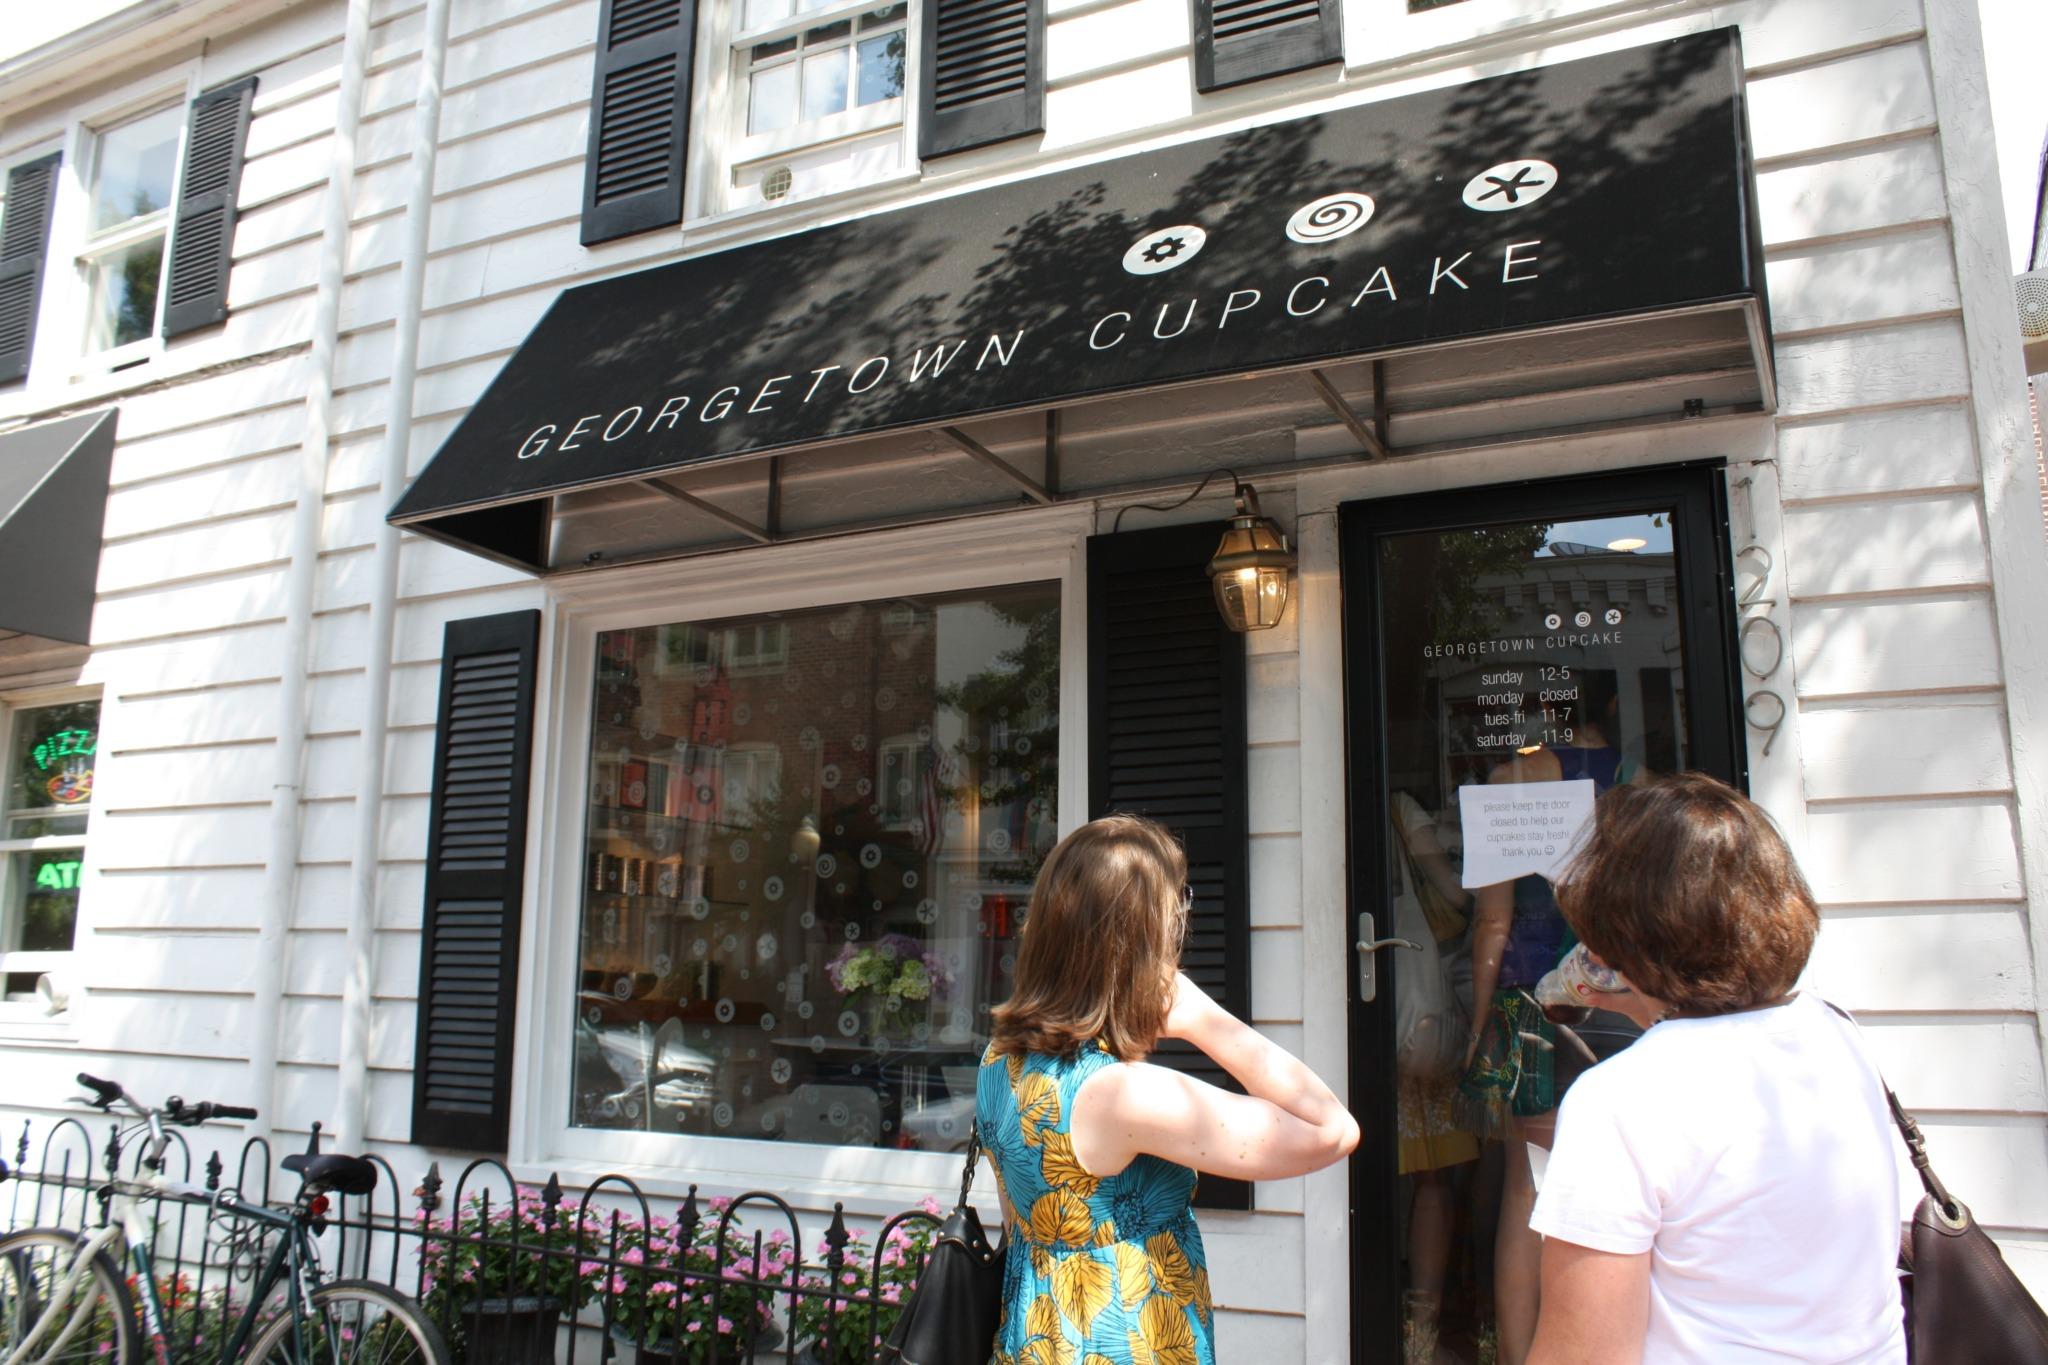 Georgetown Cupcake Exterior